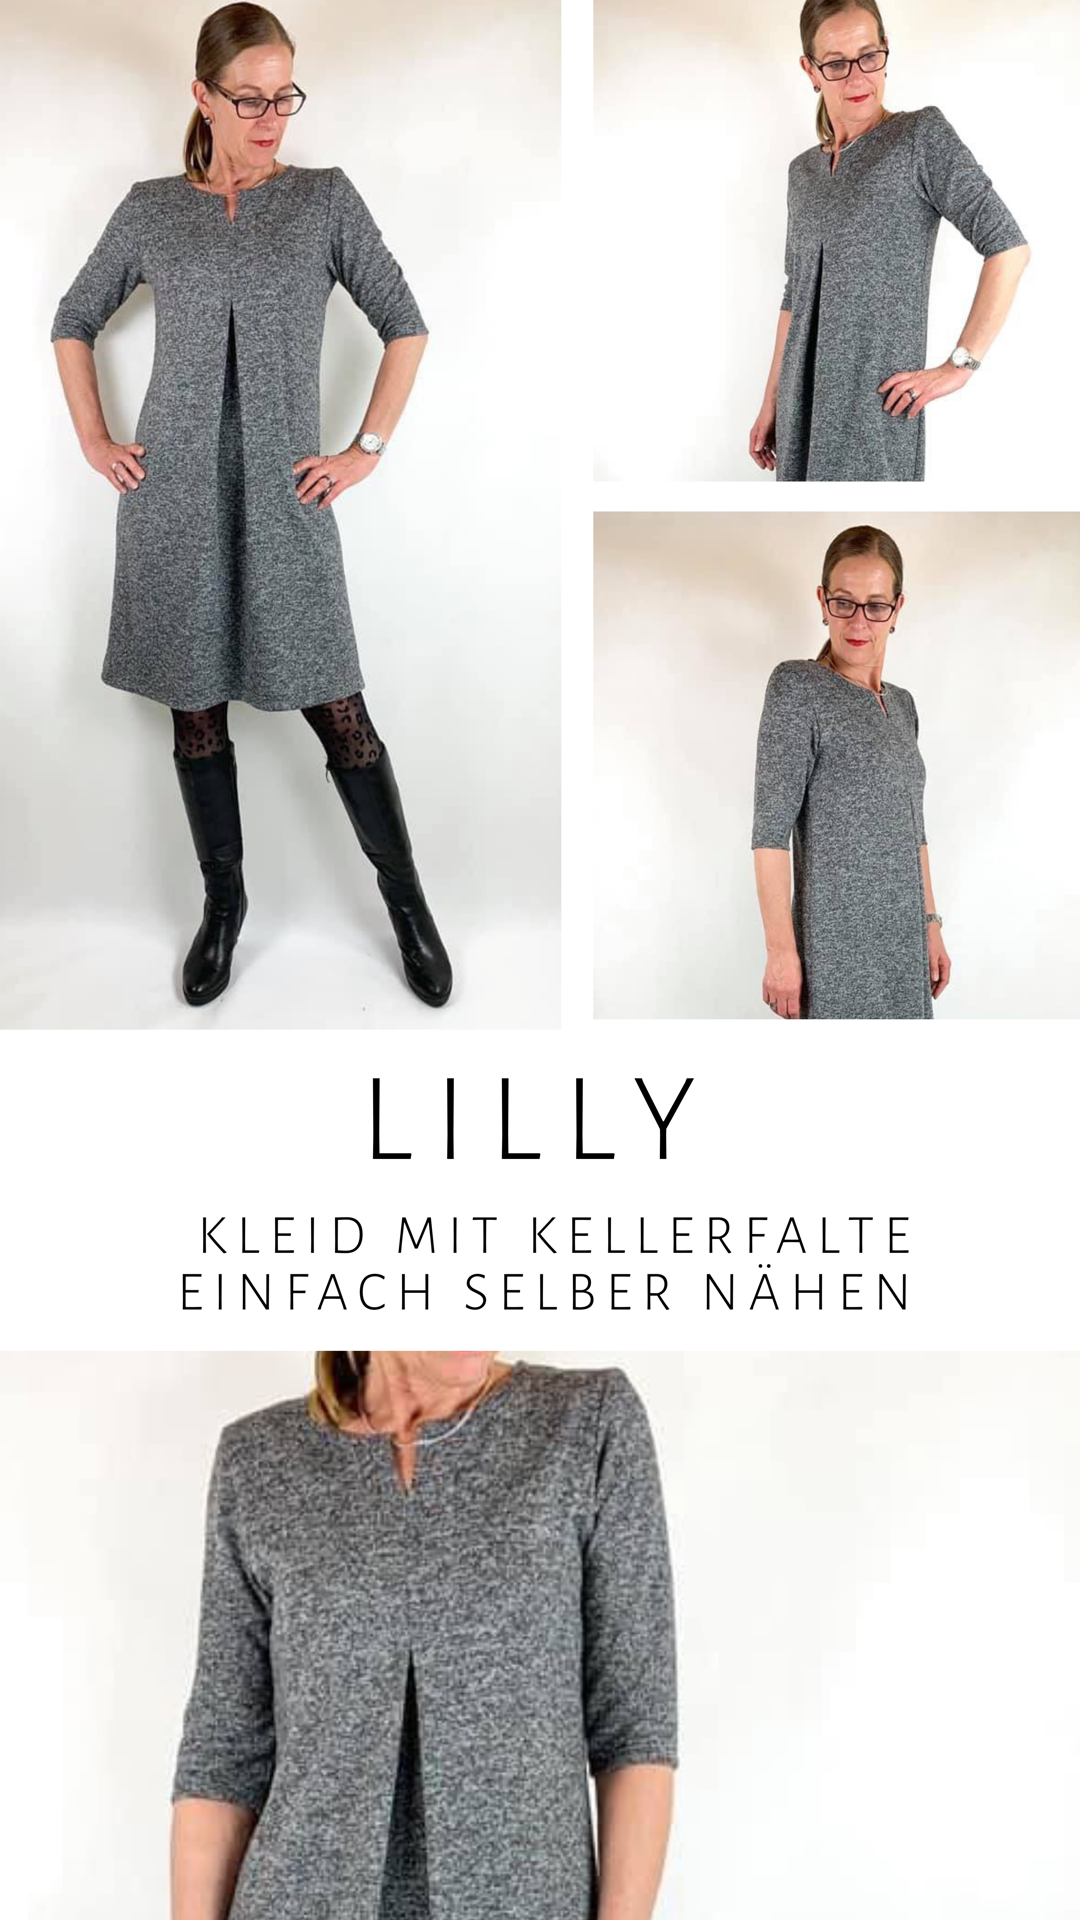 lilly - kleid oder shirt für anfänger nähen - finasideen